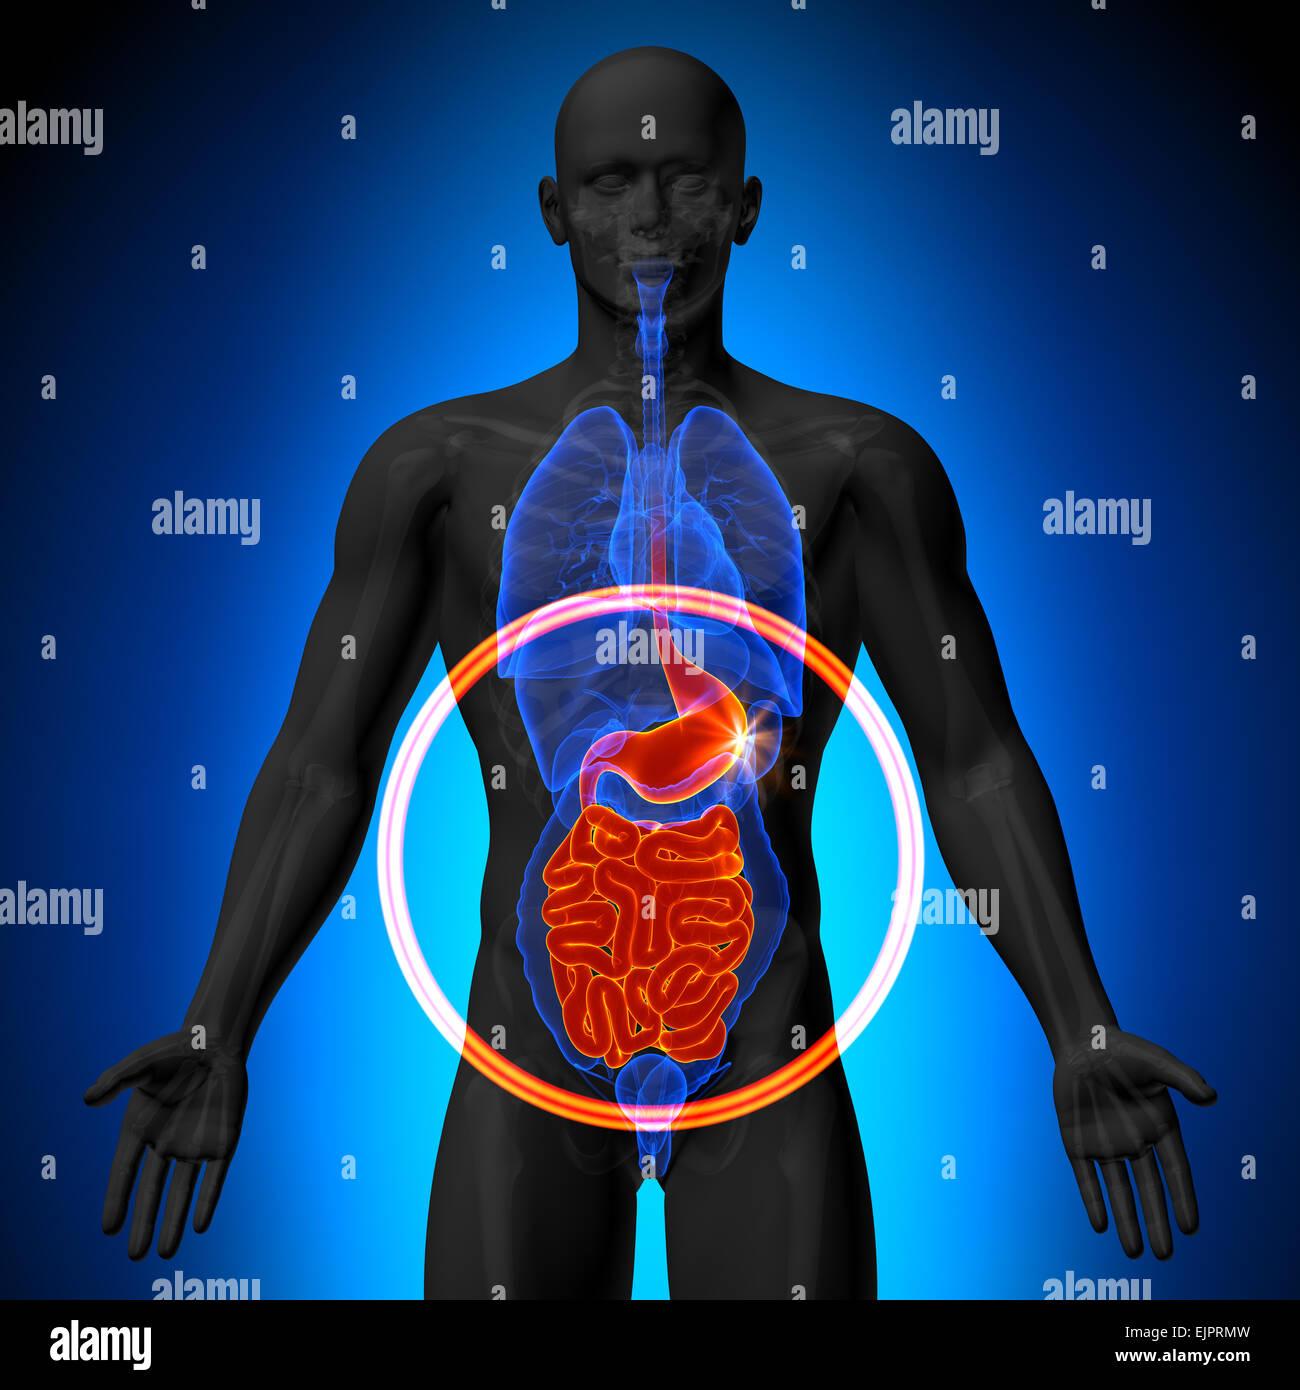 Guts Intestine Stockfotos & Guts Intestine Bilder - Alamy